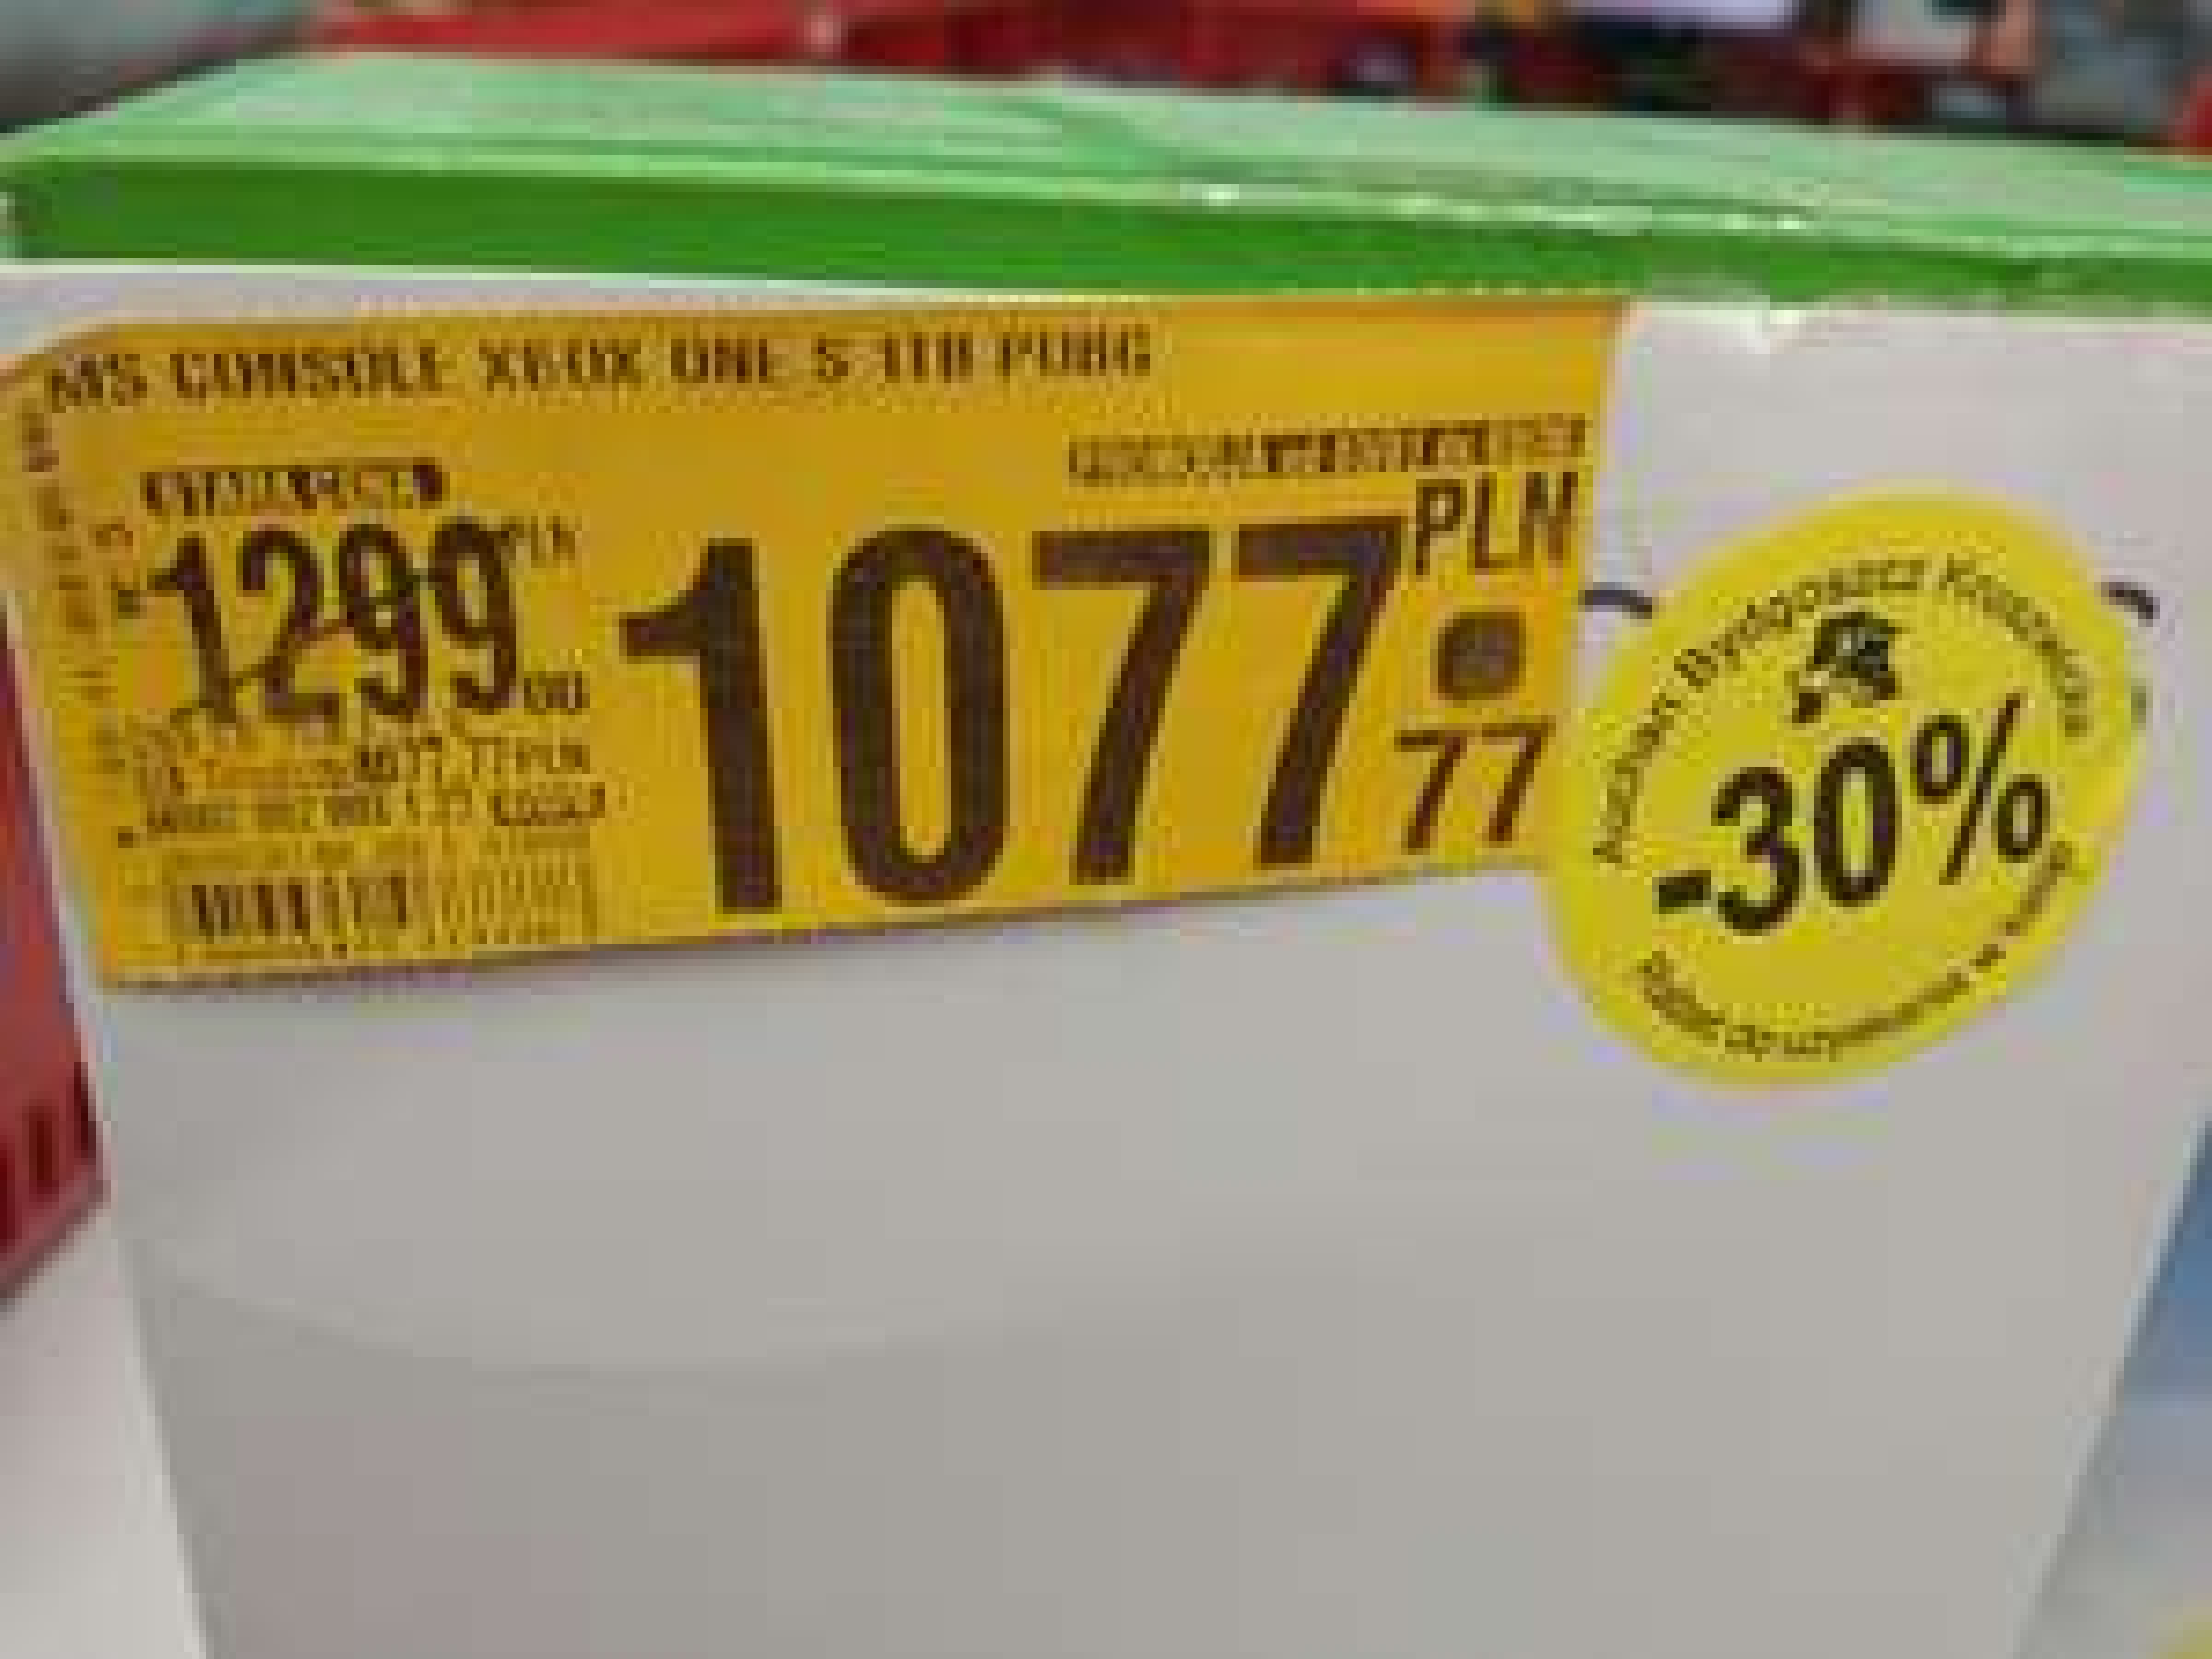 Xbox one S 1TB Pubg @Auchan (możliwe 654.44PLN)